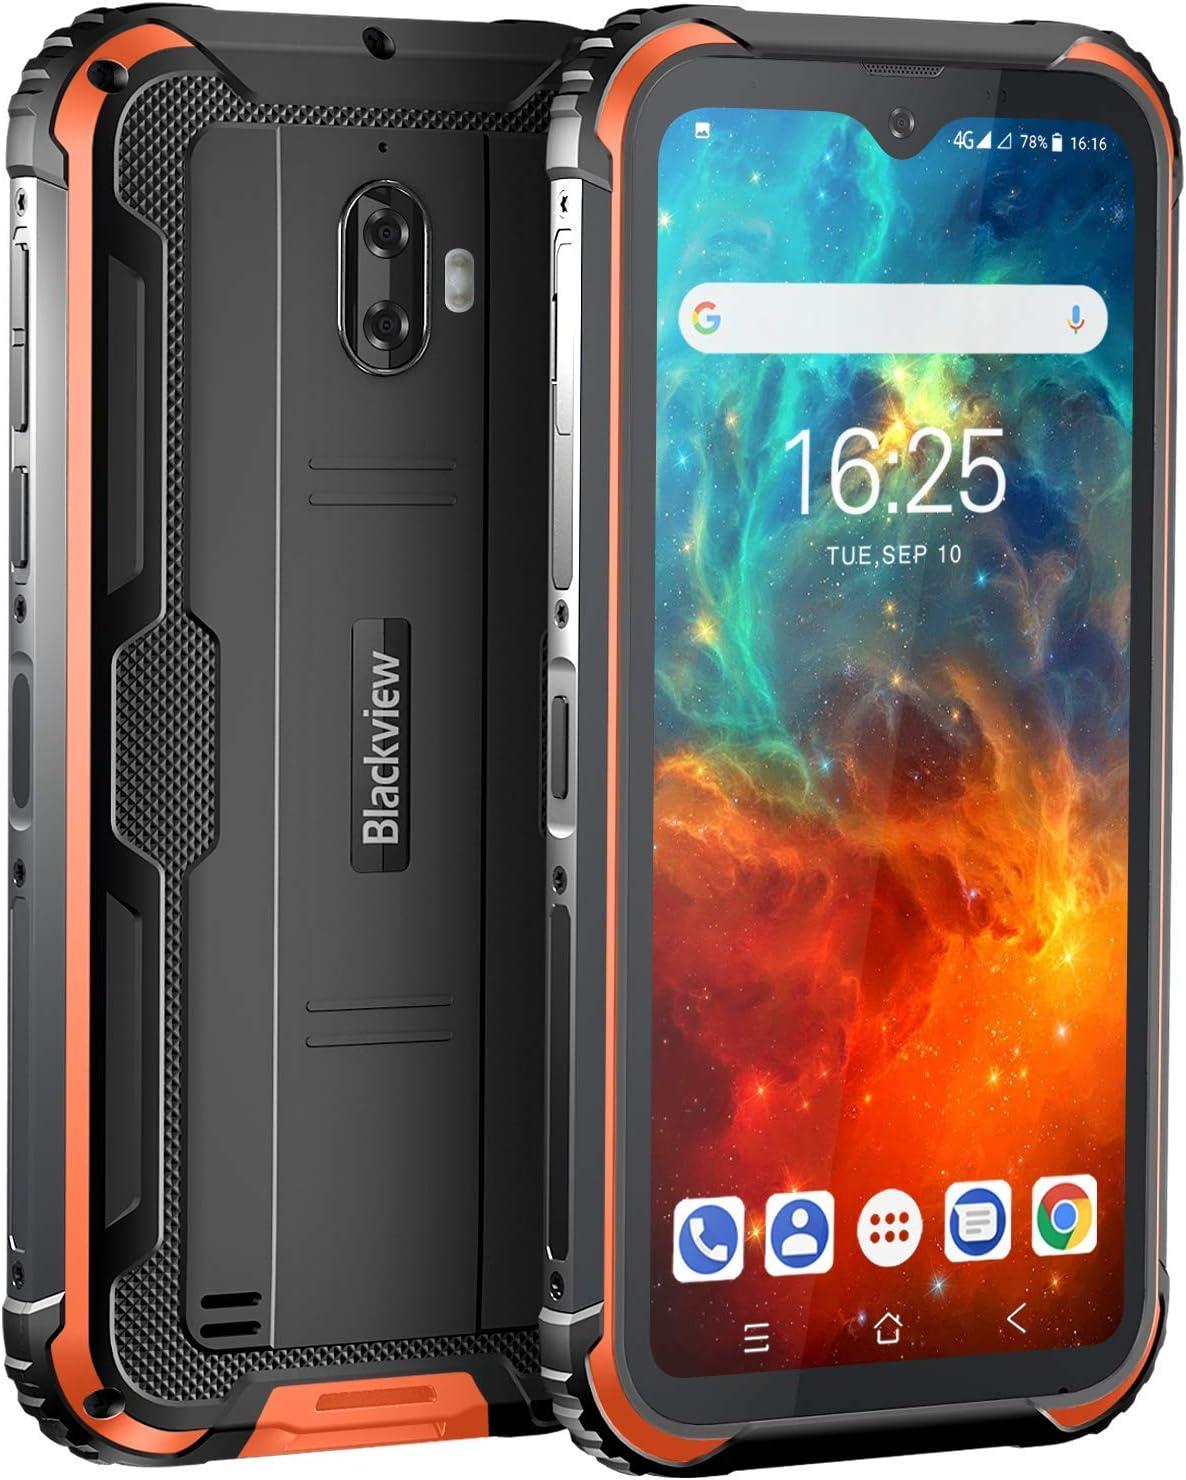 Movil Resistente, Blackview BV5900 Telefono Movil Antigolpes, 5,7 Pulgadas HD+ Display, 4G Android 9.0, Batería 5580mAh, 3GB RAM+32GB ROM, IP68 Impermeable Smartphone, Cámara 13MP+5MP,GPS/NFC-Naranja: Amazon.es: Electrónica